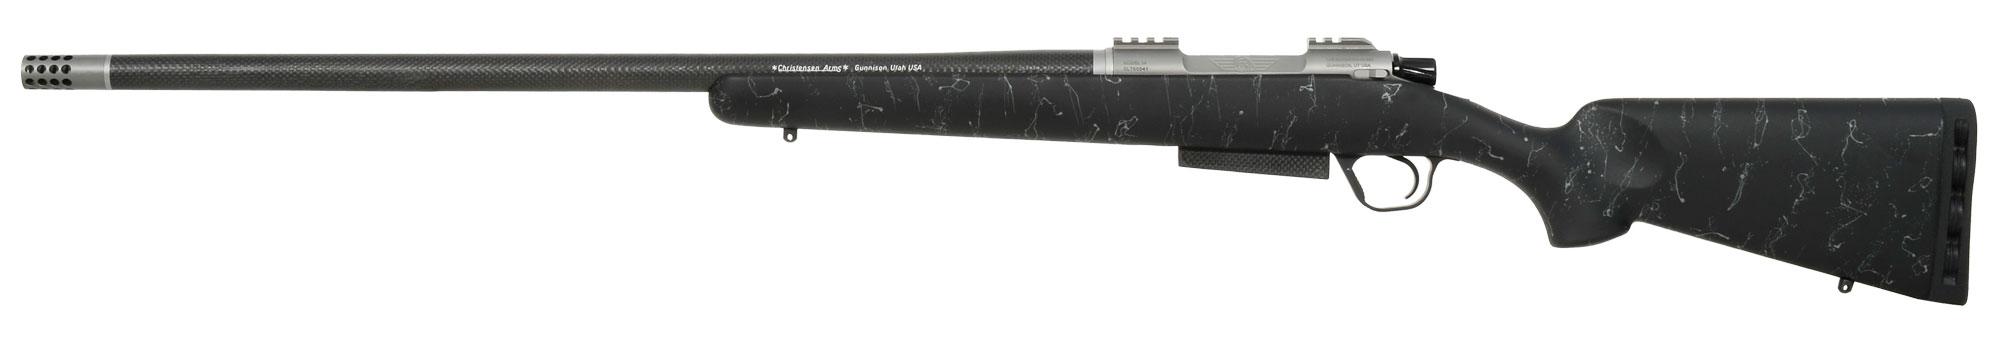 Christensen Arms Summit Carbon Titanium 300 Win Mag  26